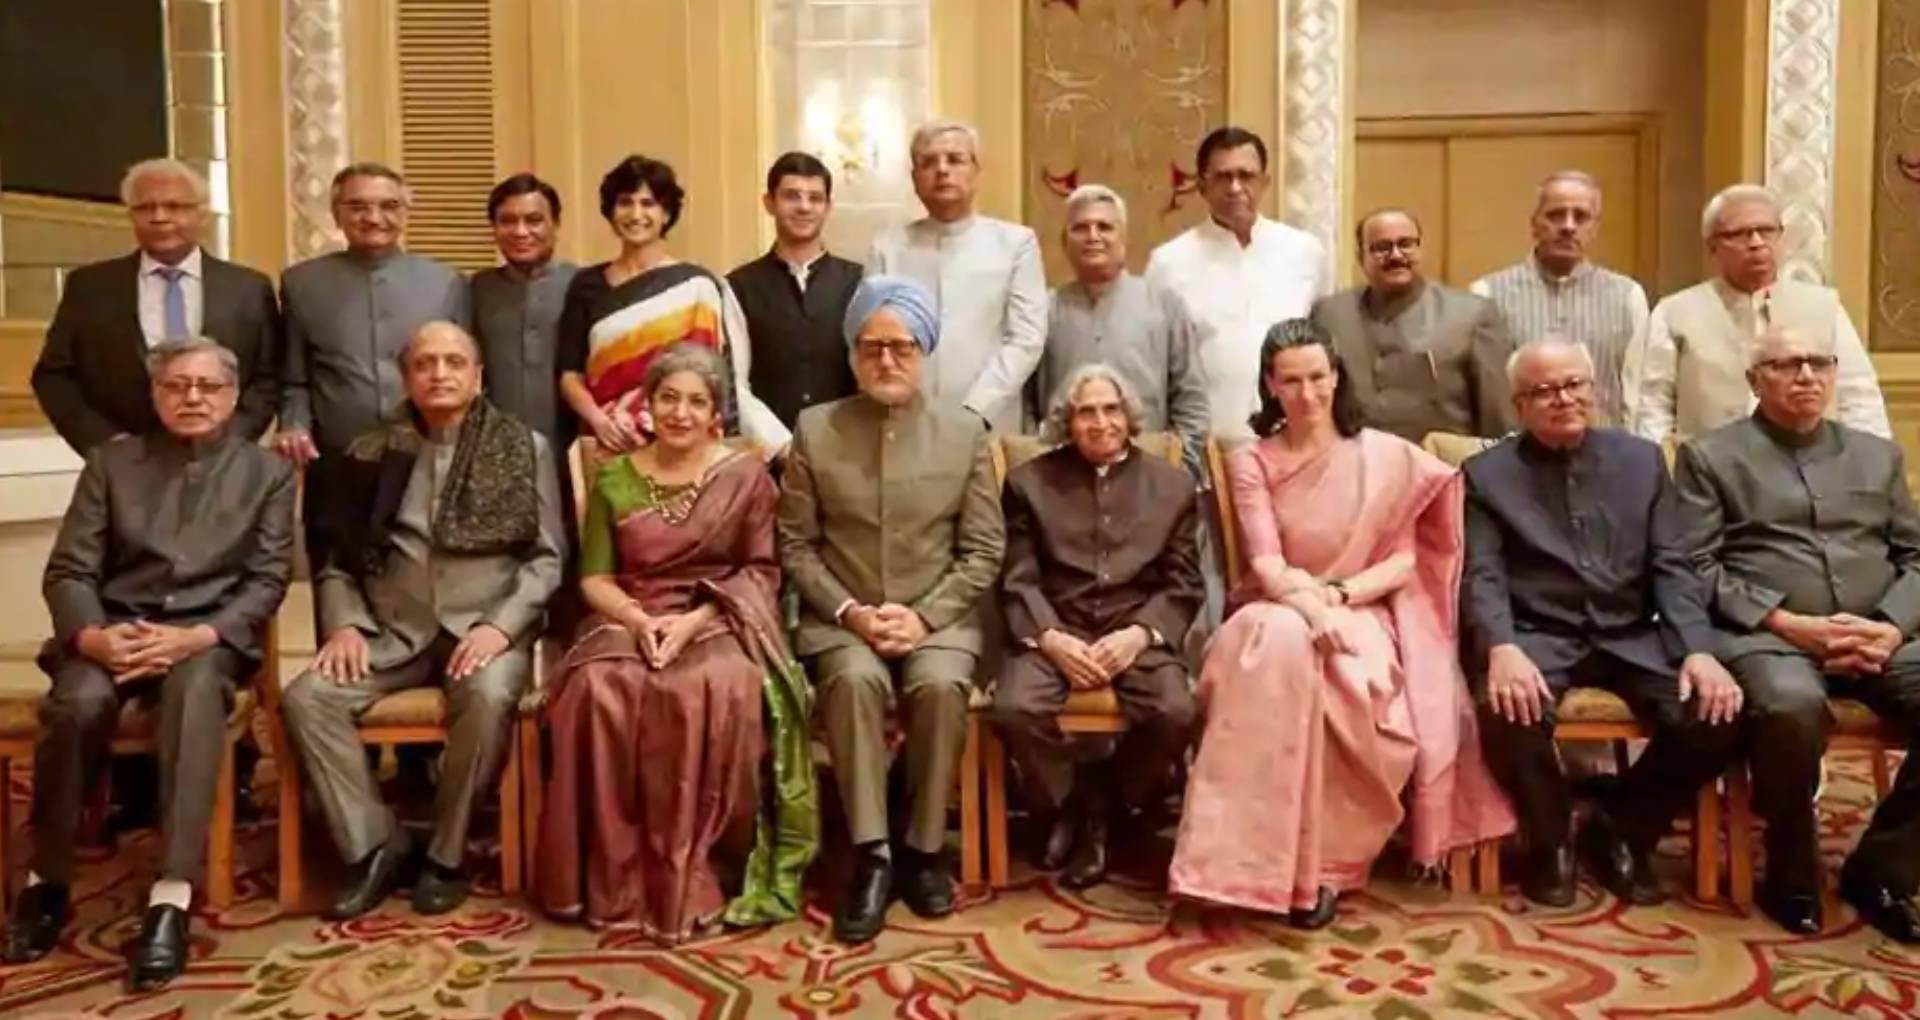 The Accidental Prime Minister: ममता बनर्जी ने साधा PM पर निशाना, कहा- अब बनेगी द डिजास्टर प्राइम मिनिस्टर